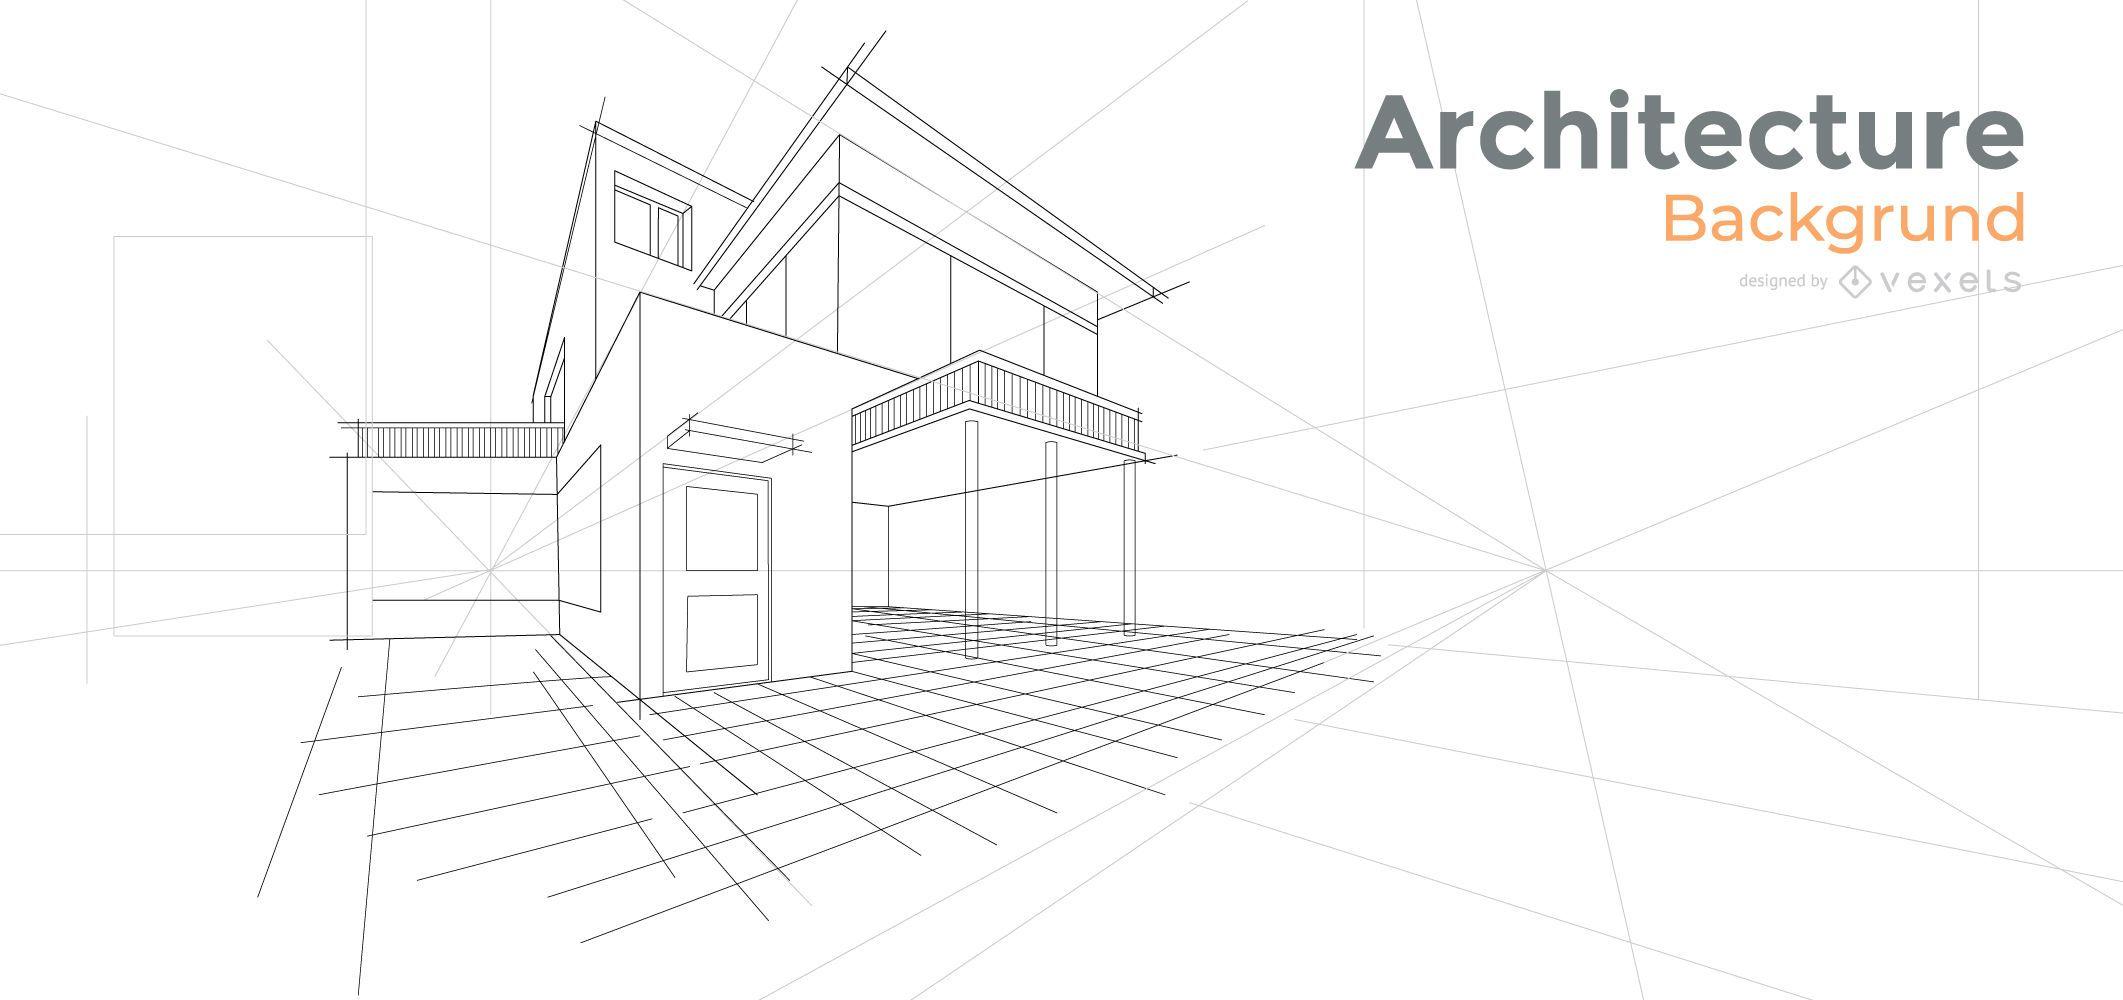 Architecture house background design